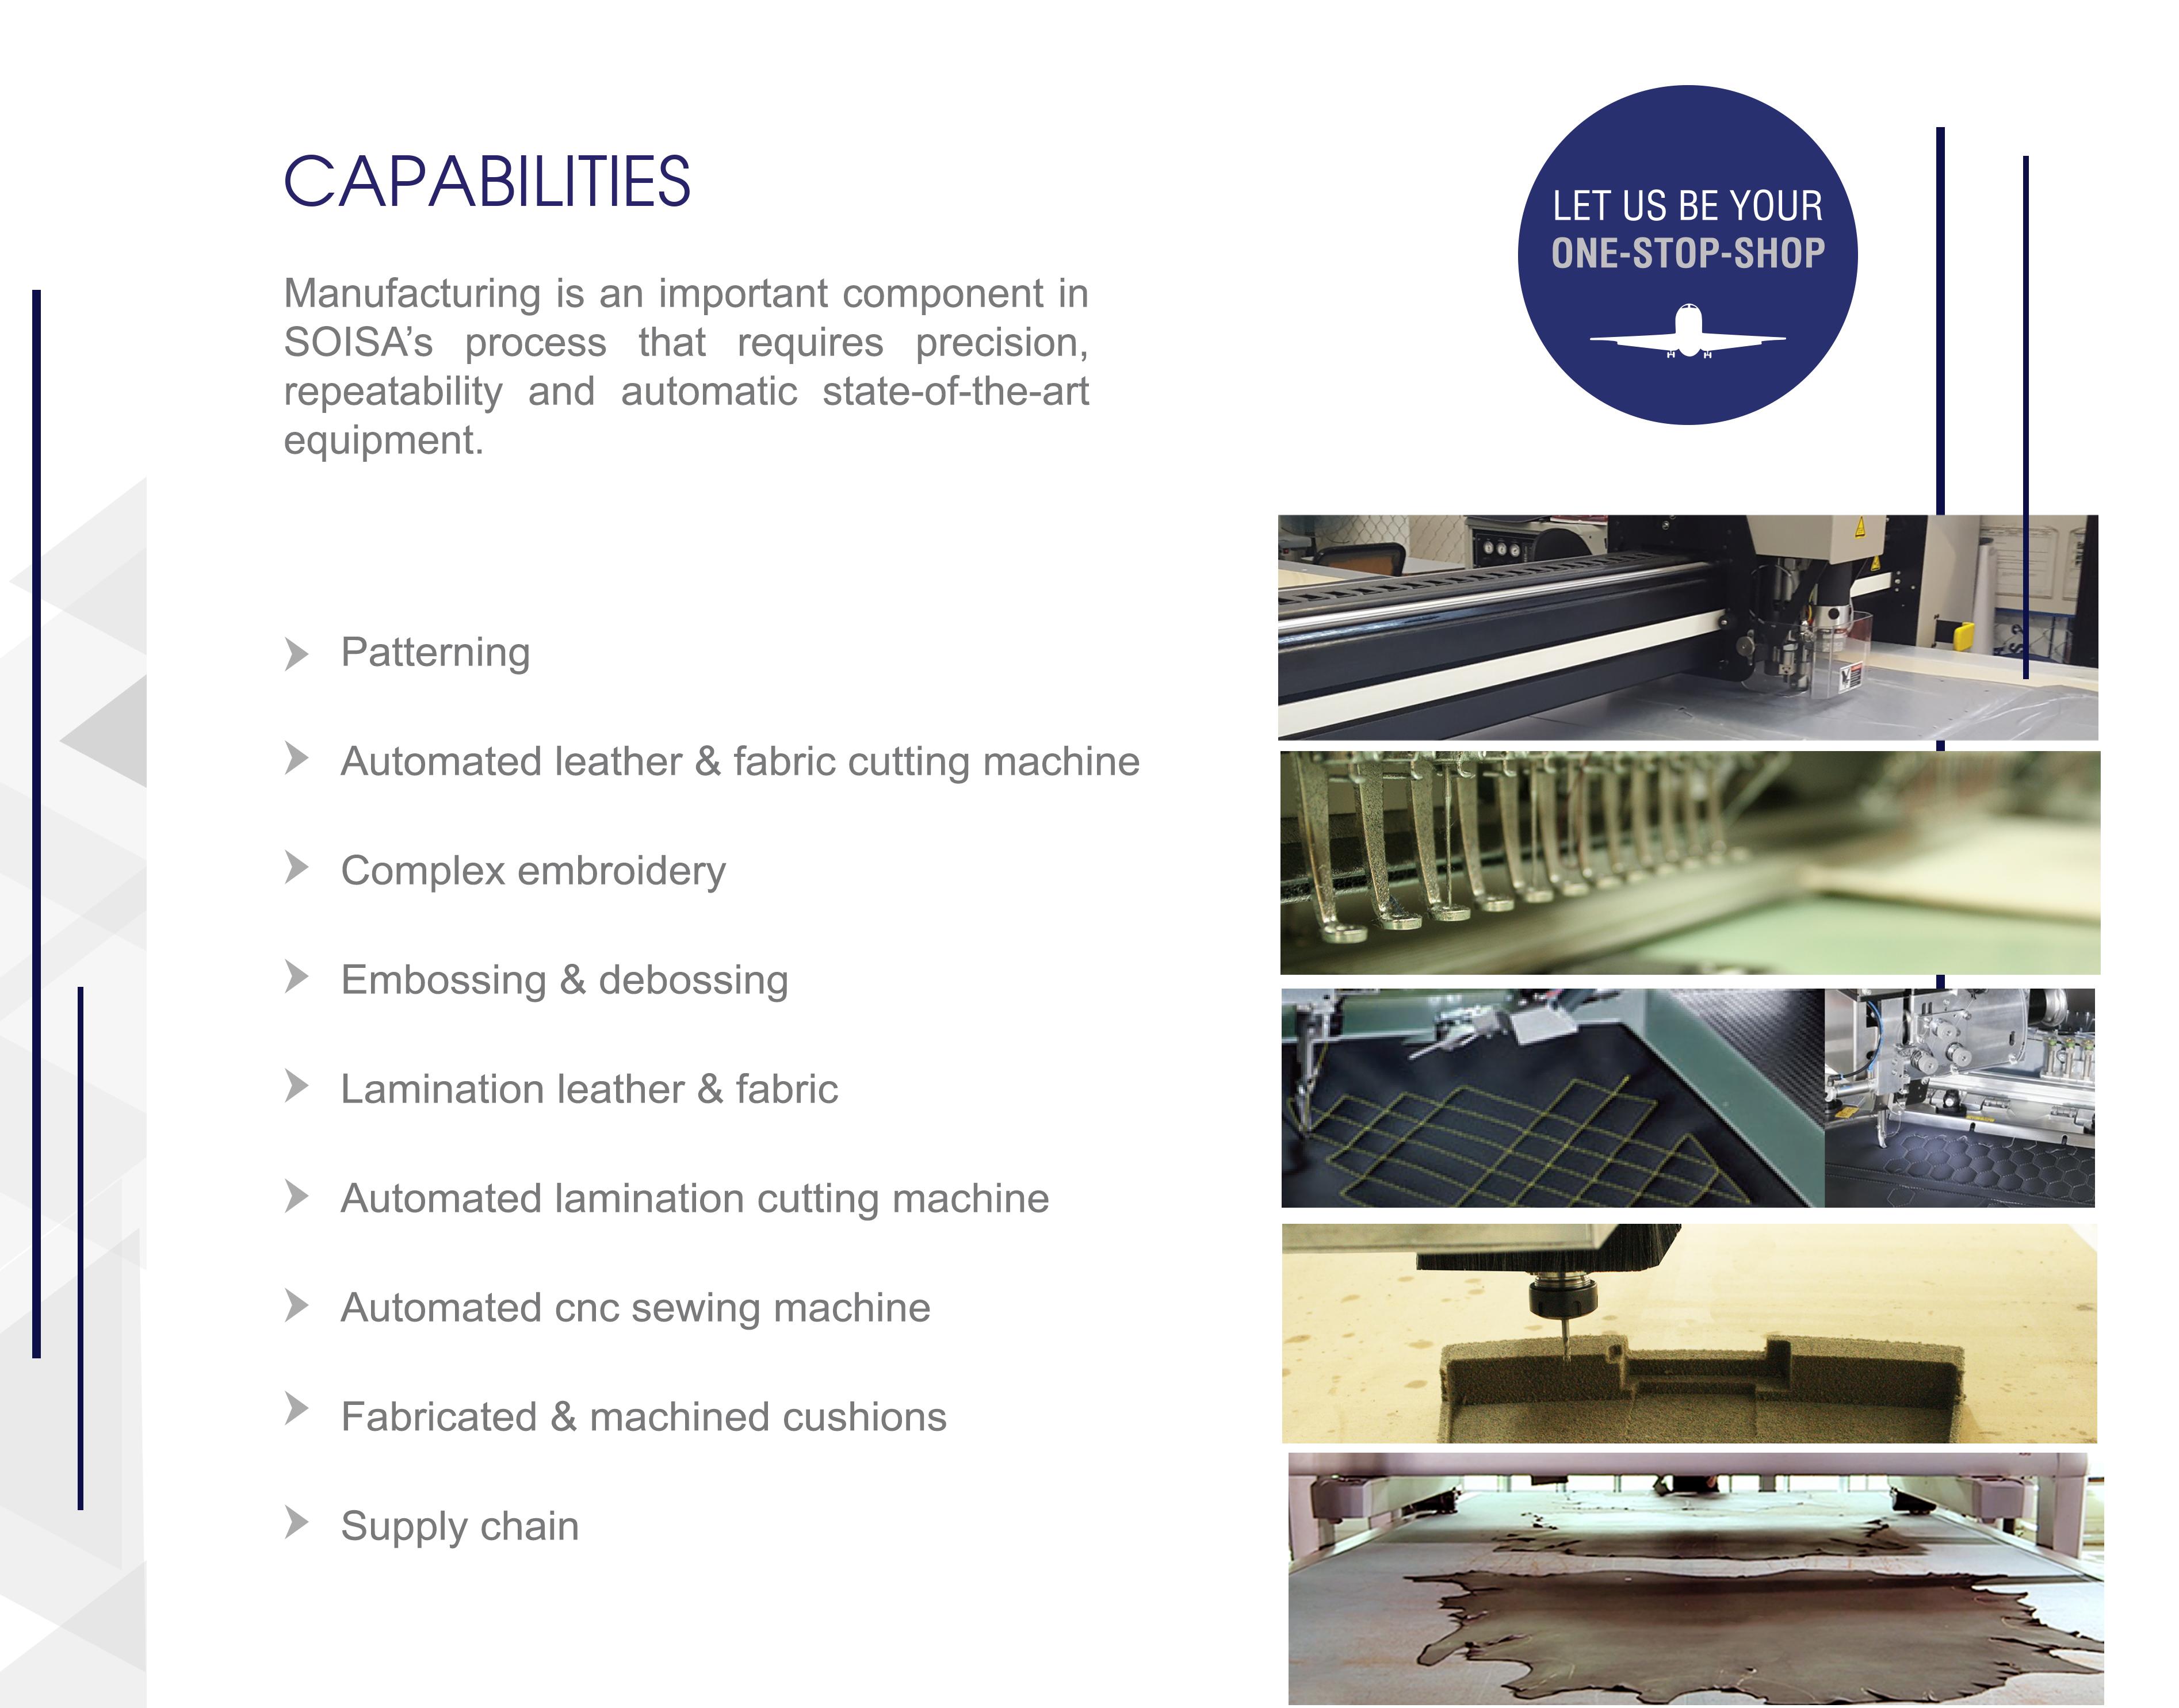 capabilities1